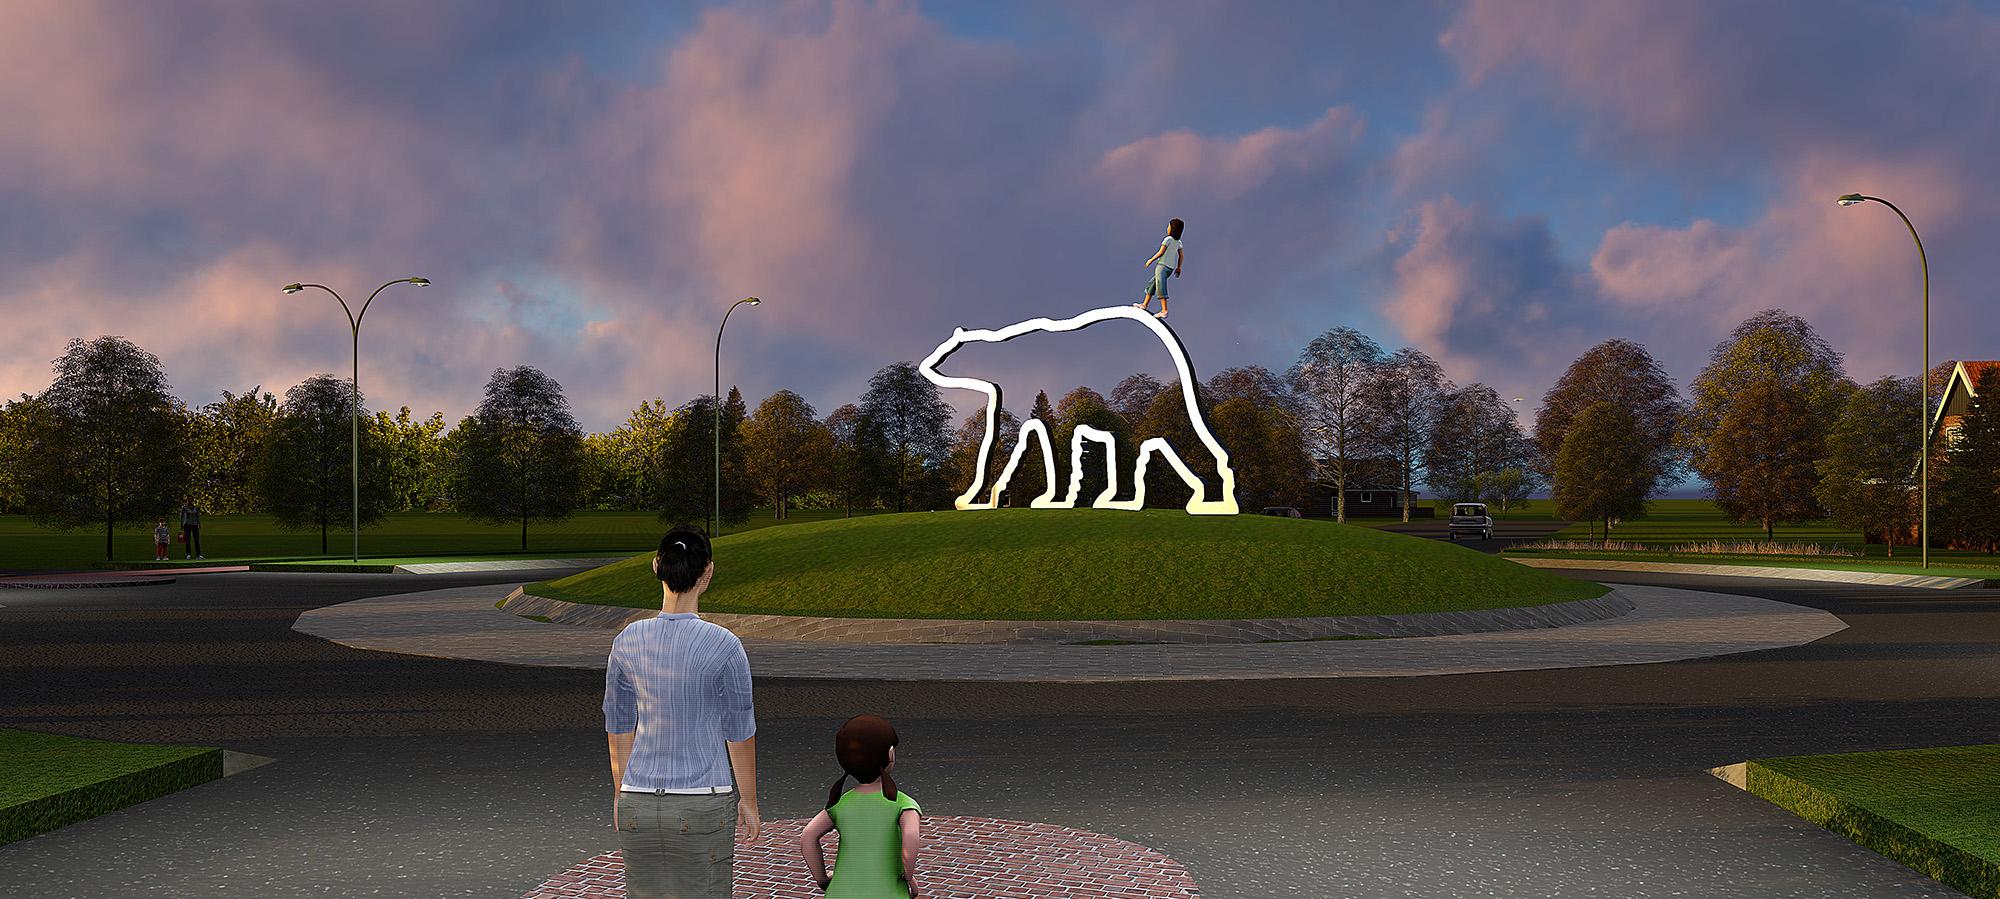 kunst openbare ruimte Berg en Dal,BlokLugthart,kunstwerk